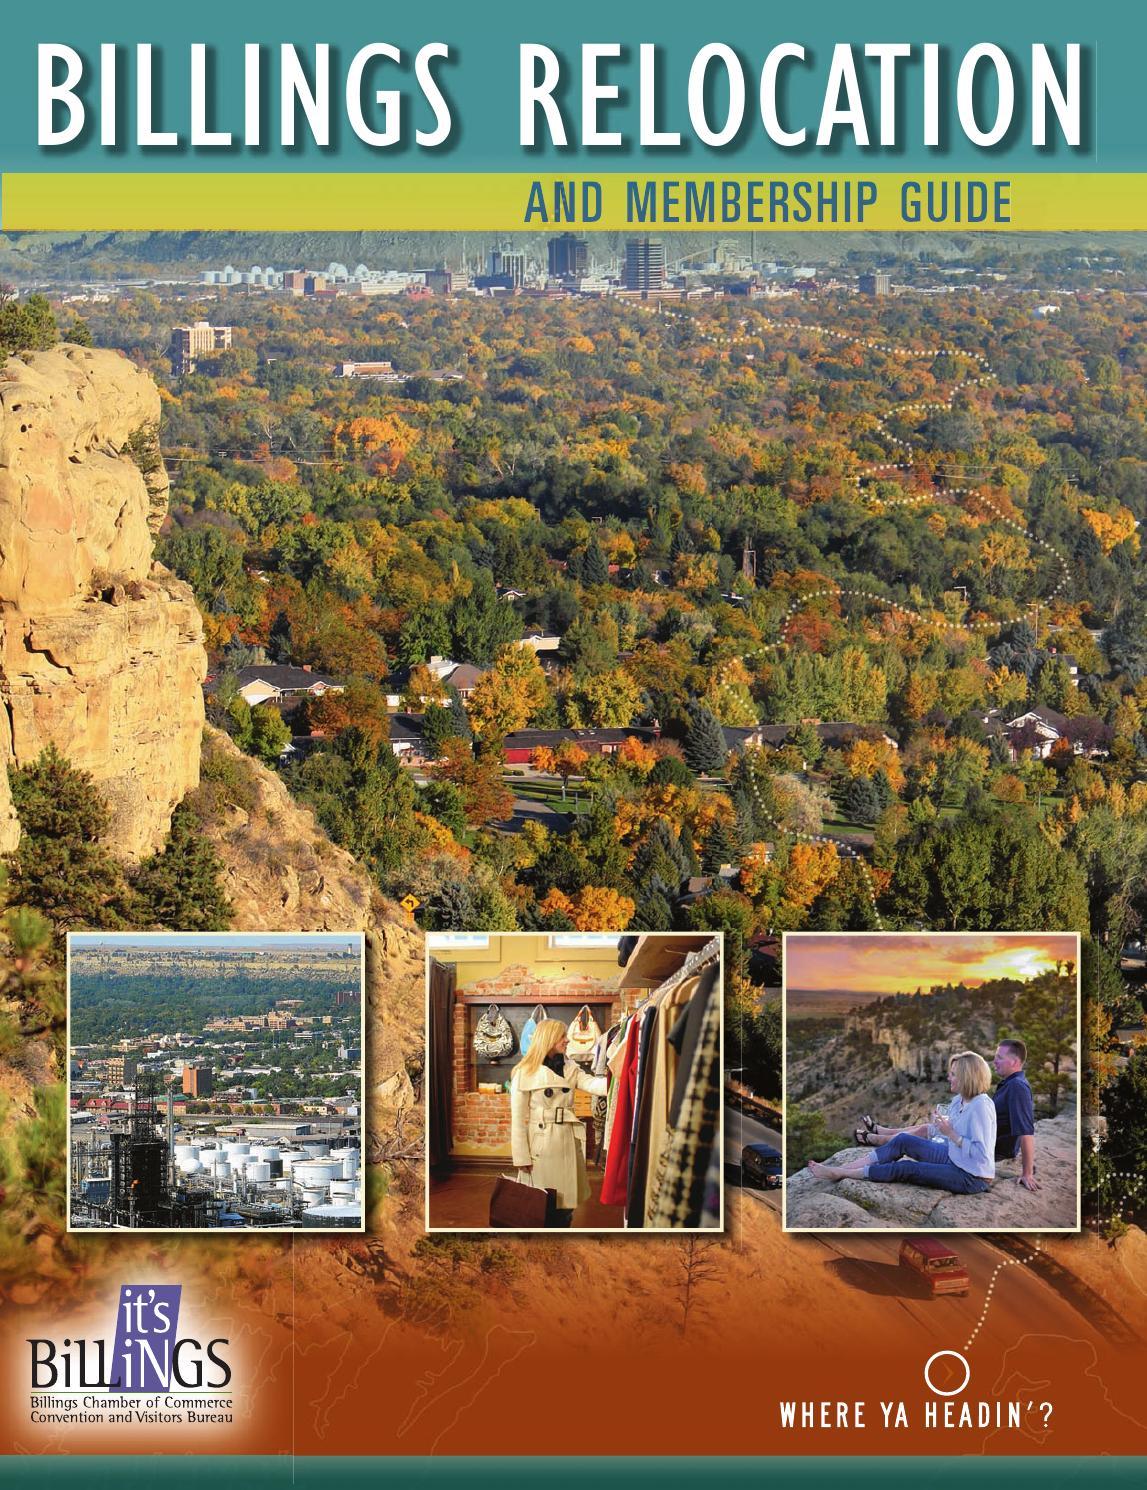 Relocation Guide 2013 by Billings Gazette - issuu